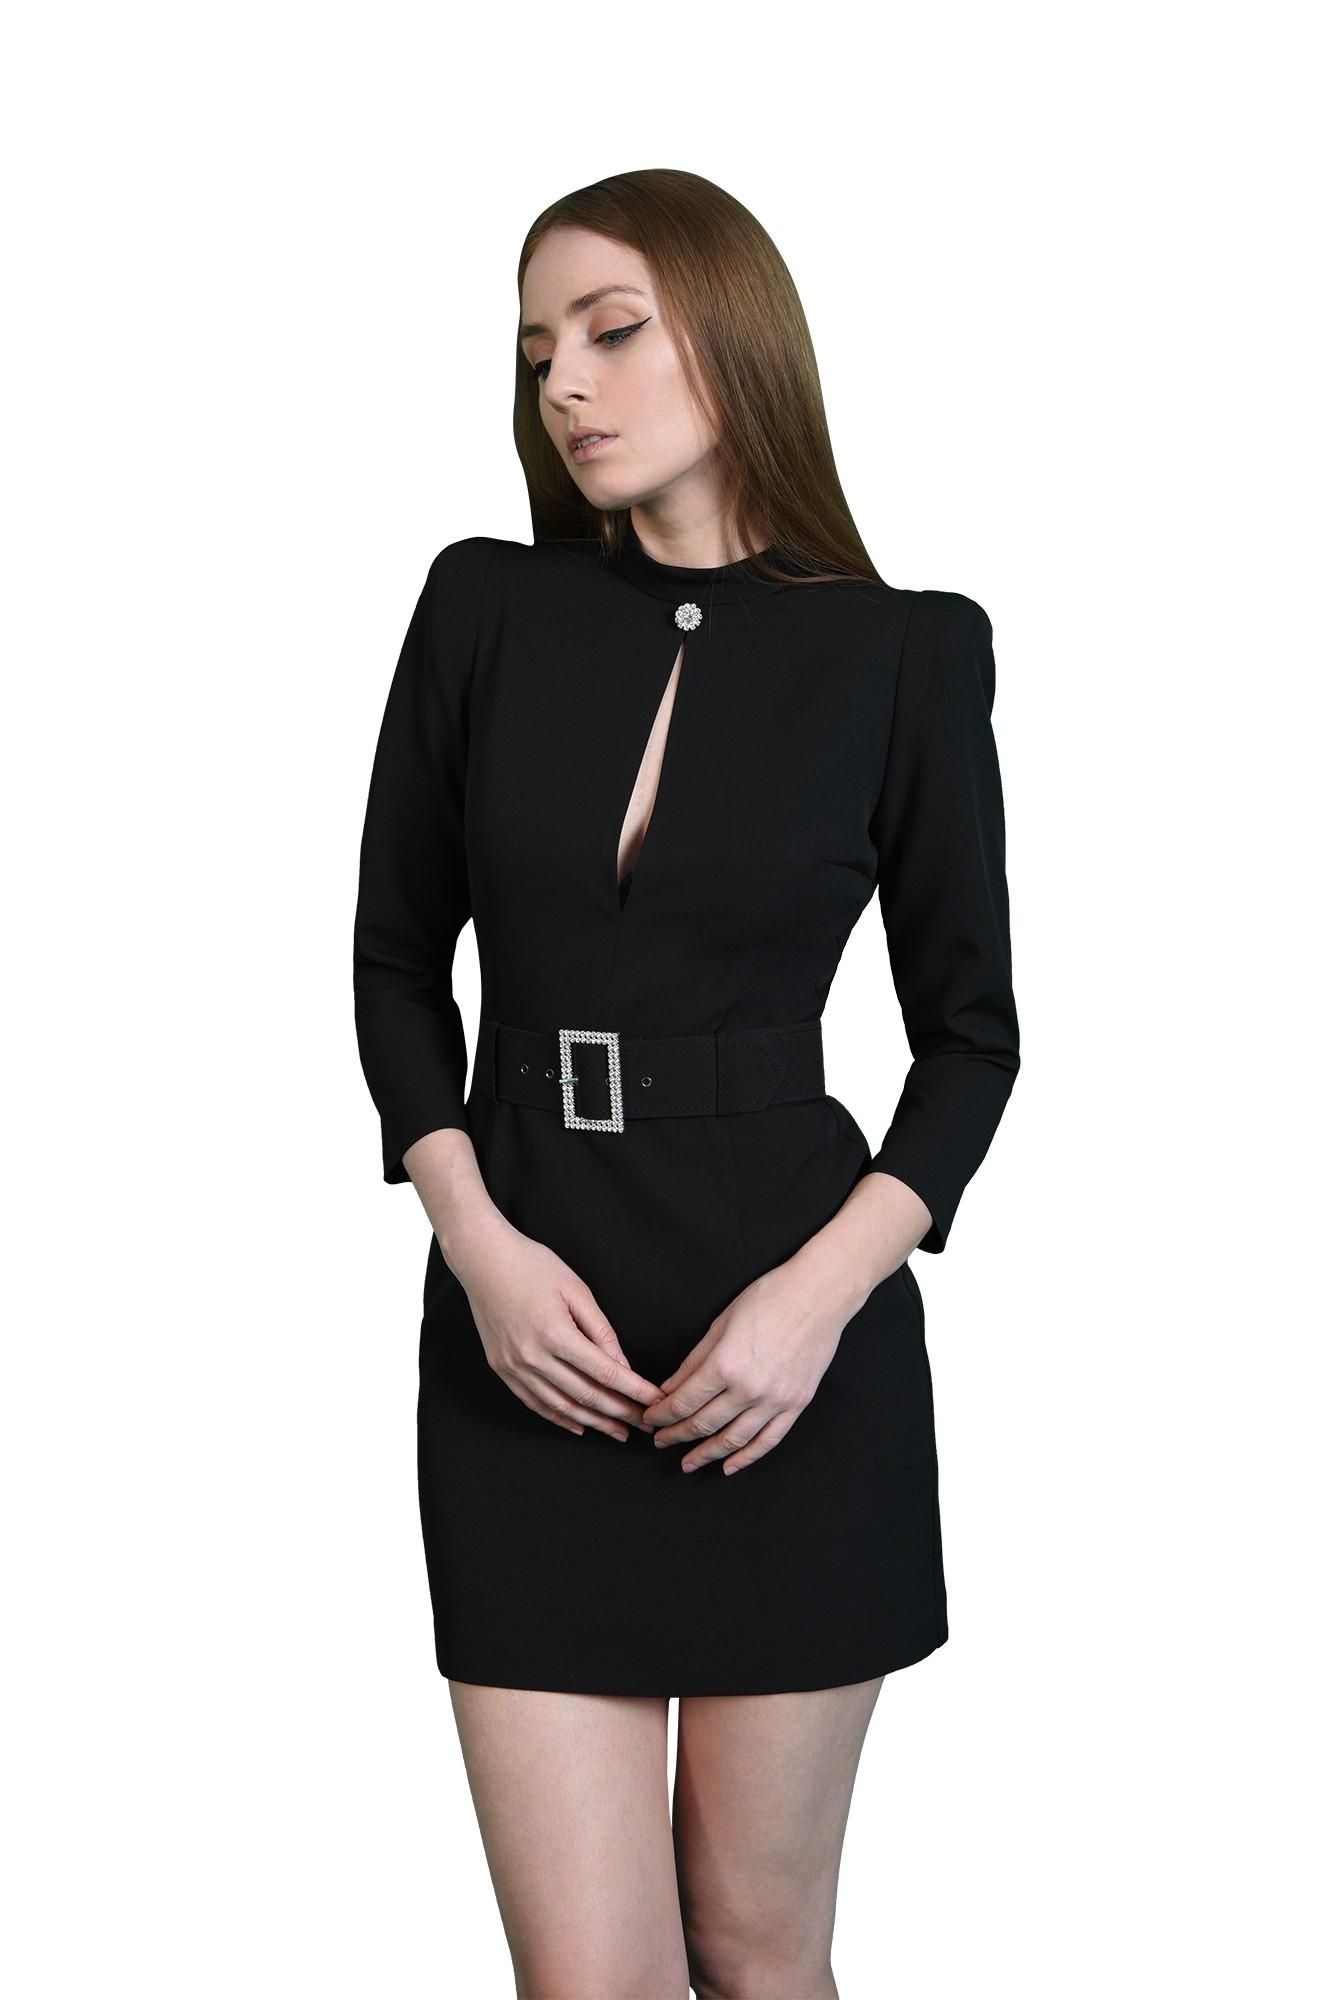 3 - rochie eleganta, neagra, cu centura din strasuri